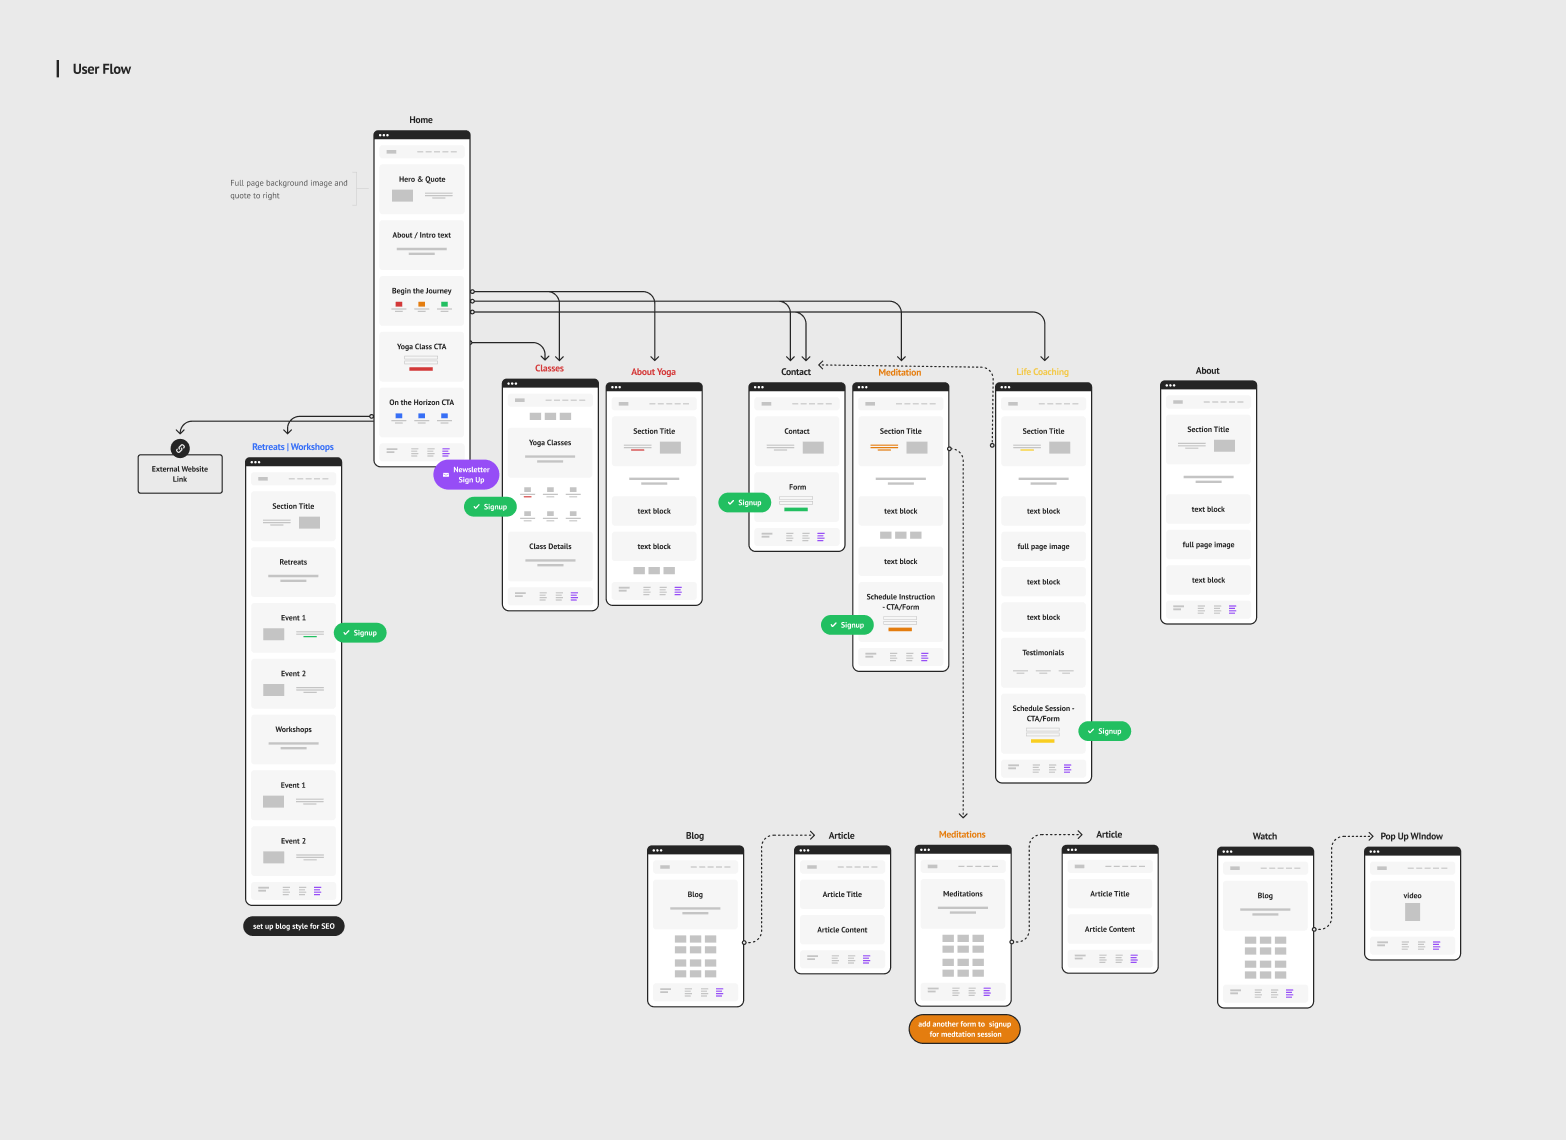 UX User Flow diagram for client's website design